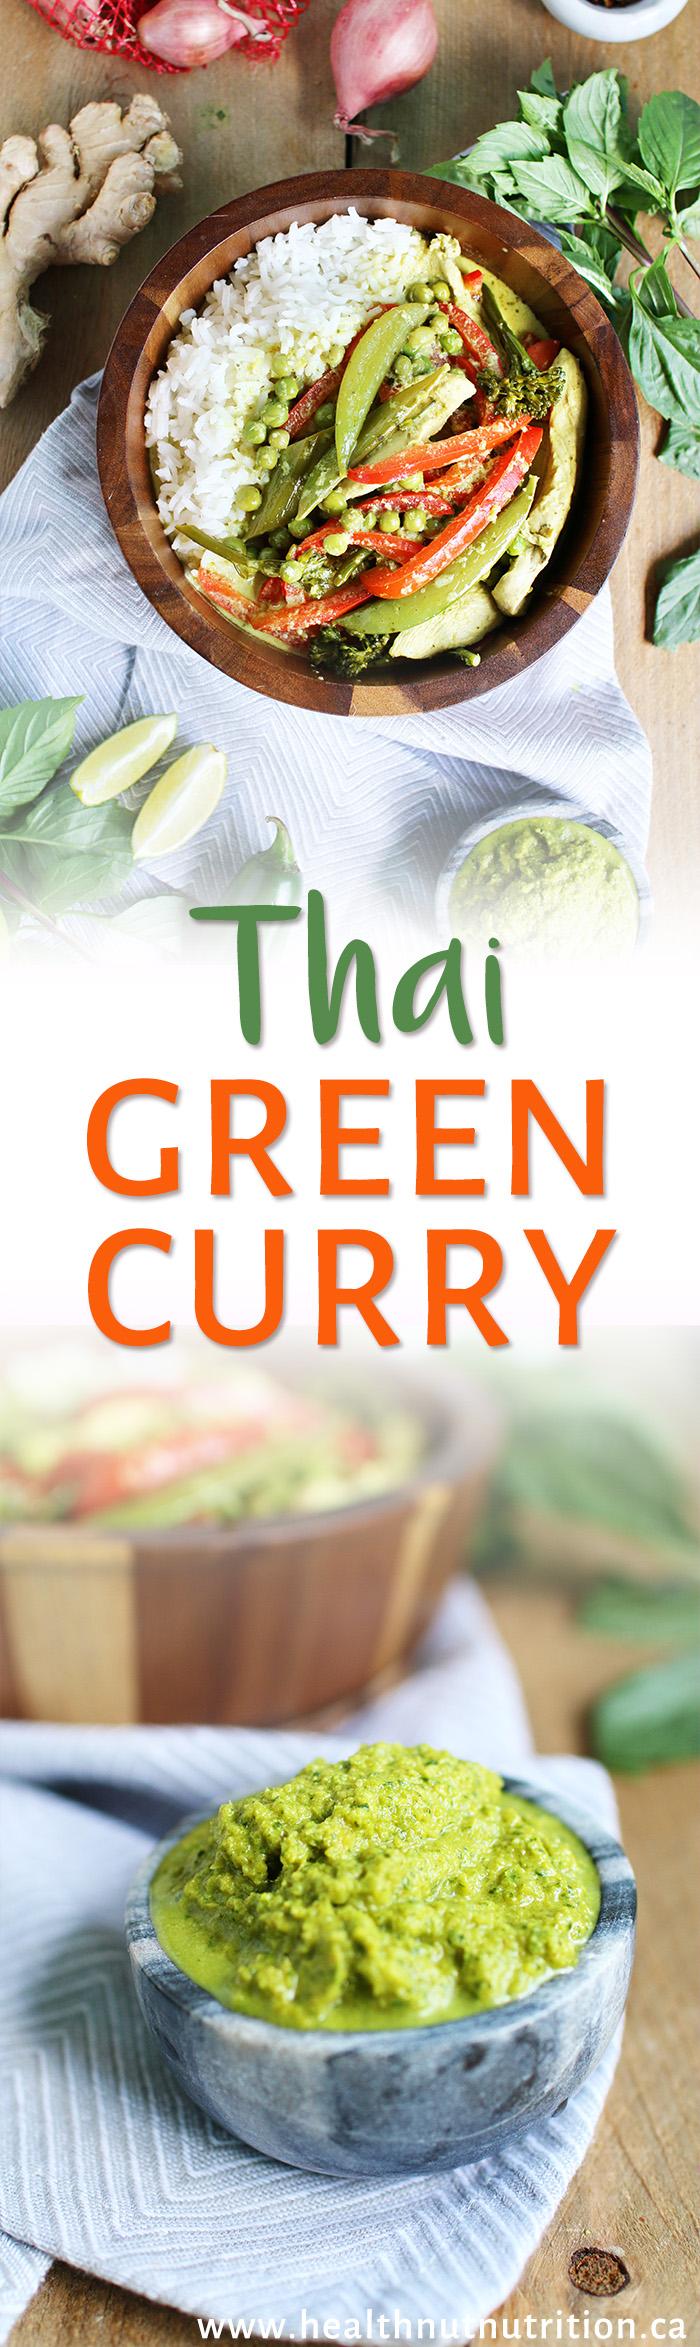 The best Thai Green Curry recipe in under 30 min!